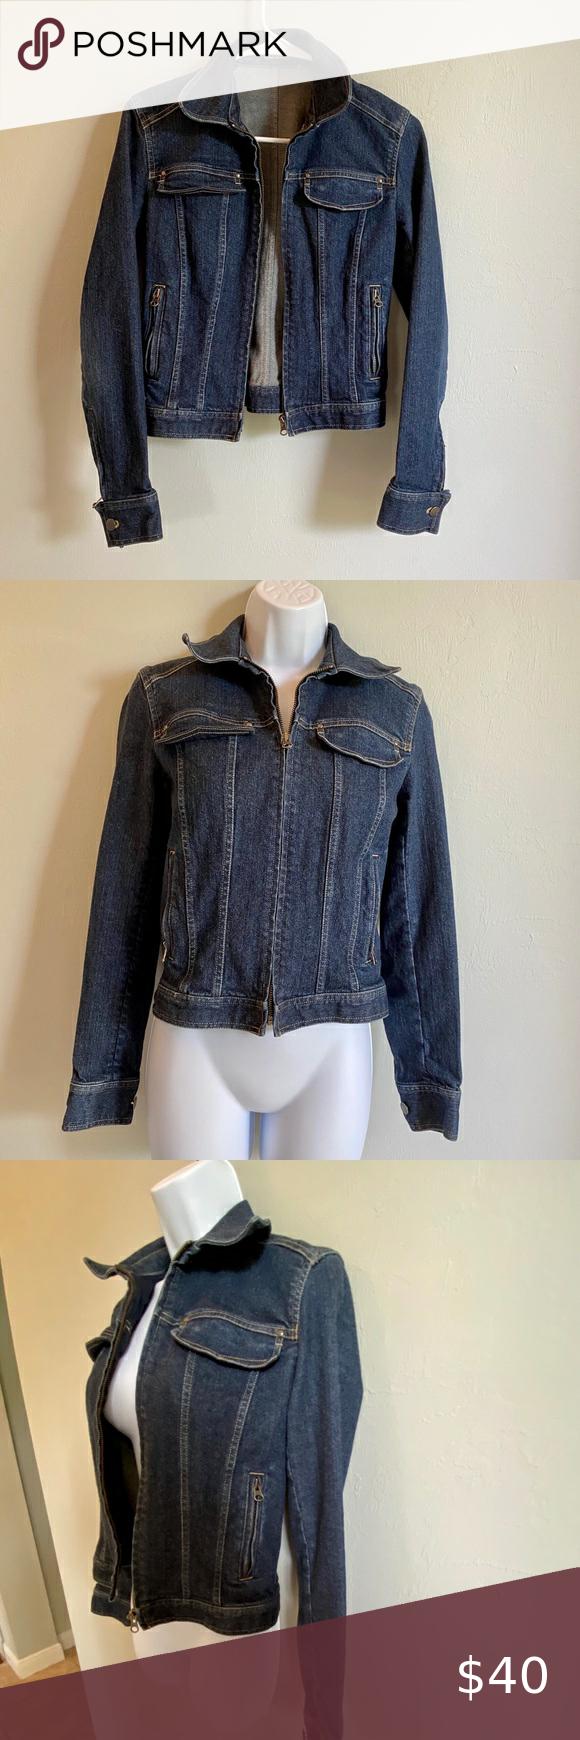 Tahari Jean Jacket With Zipper Xs Fitted Denim Jacket Coats Jackets Women Tencel Jacket [ 1740 x 580 Pixel ]